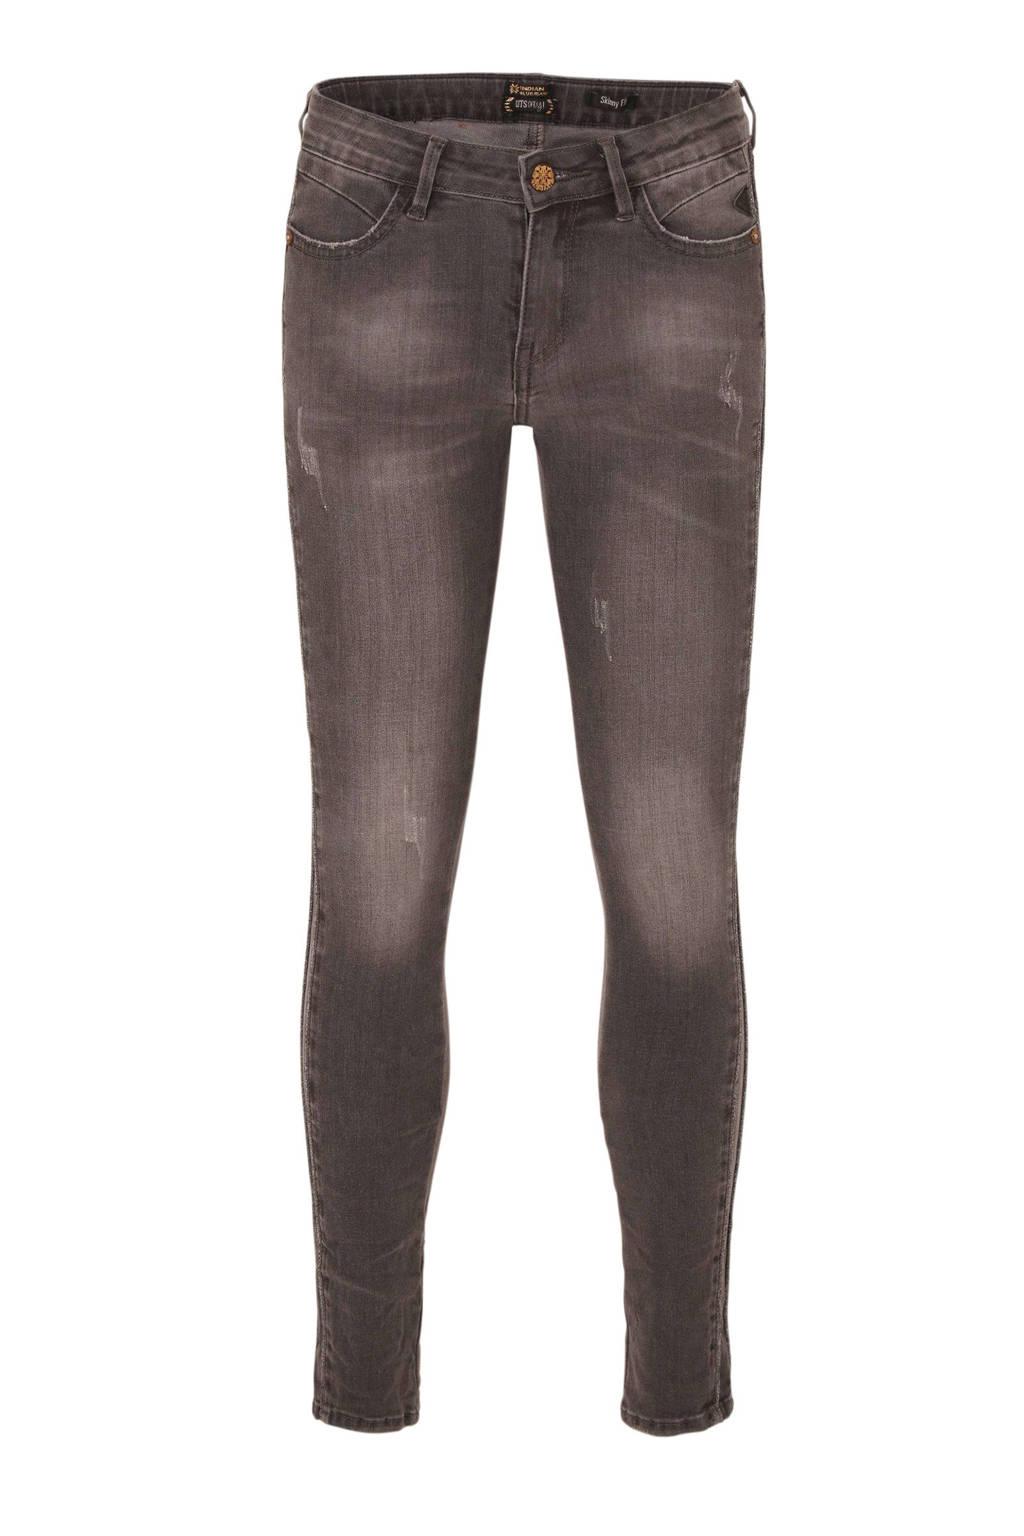 Indian Blue Jeans skinny jeans Nova met zijstreep grey denim, Grey denim